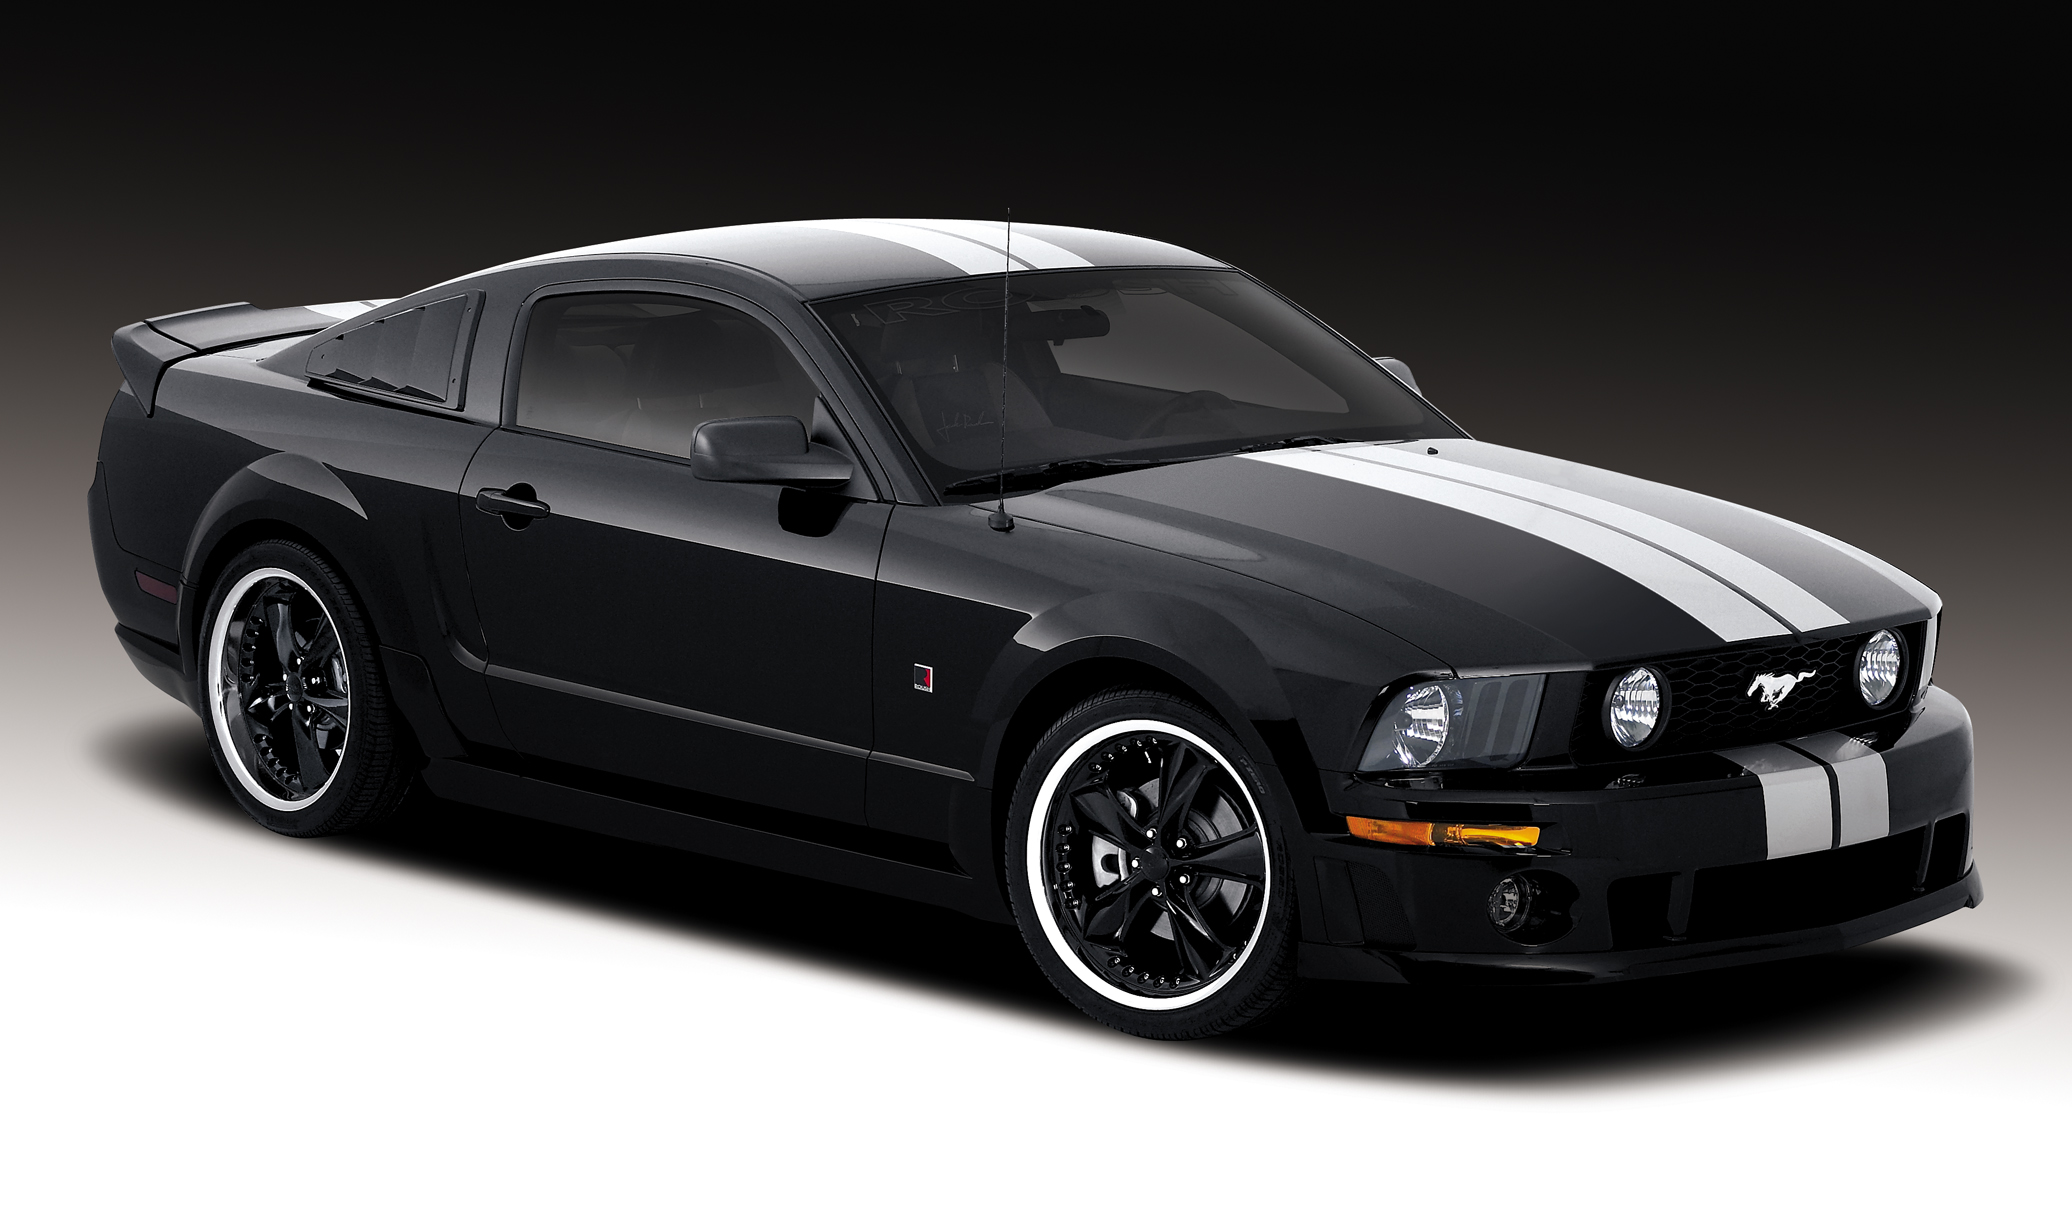 Red And Black Mustang Cars Free Wallpaper Hdblackwallpapercom - Cool cars mustang